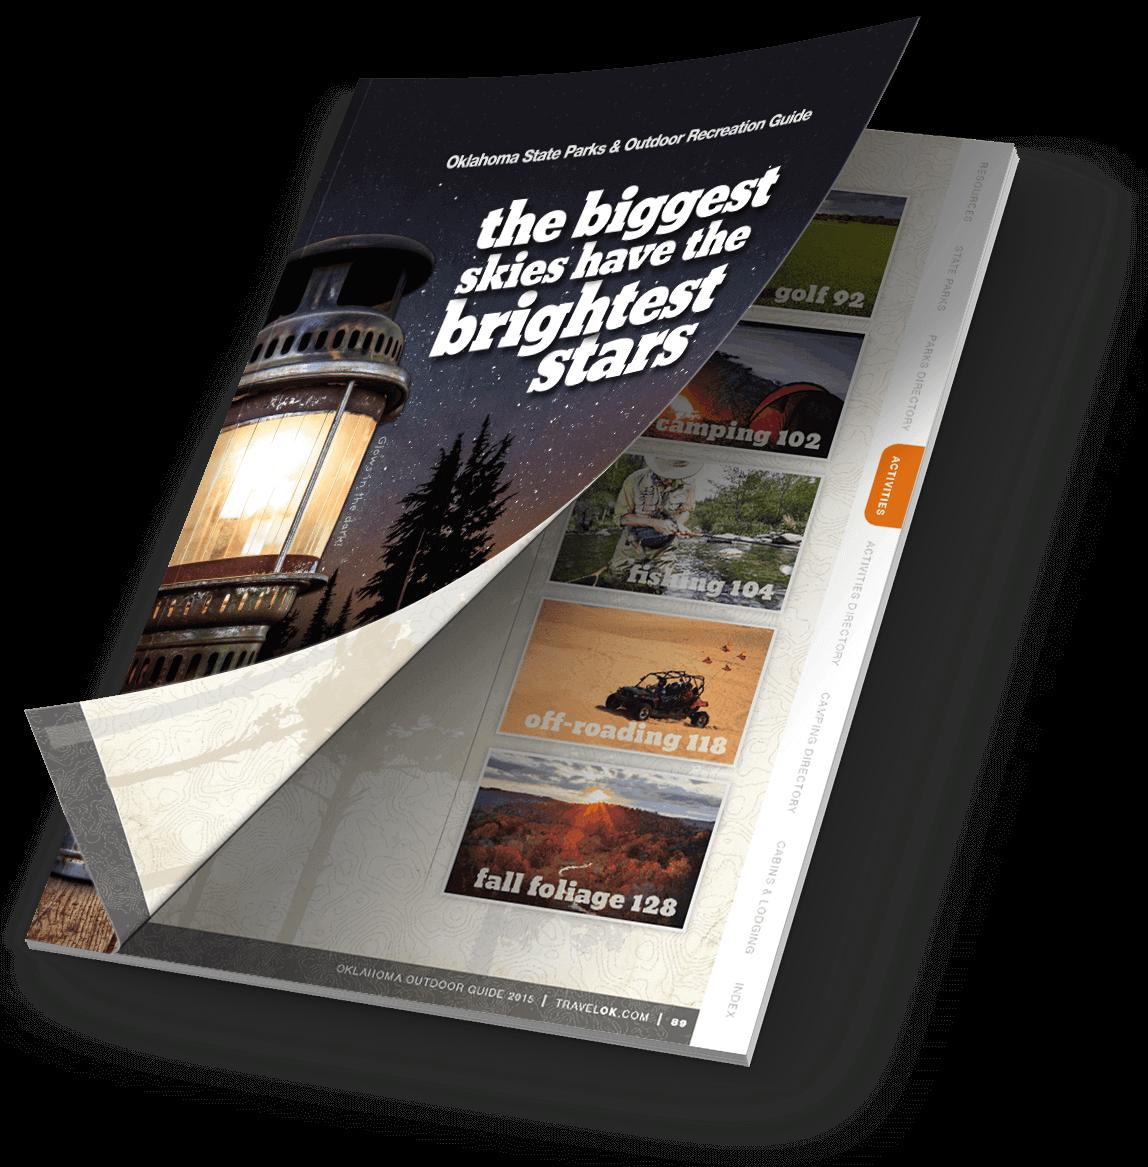 okstateparks-guide1